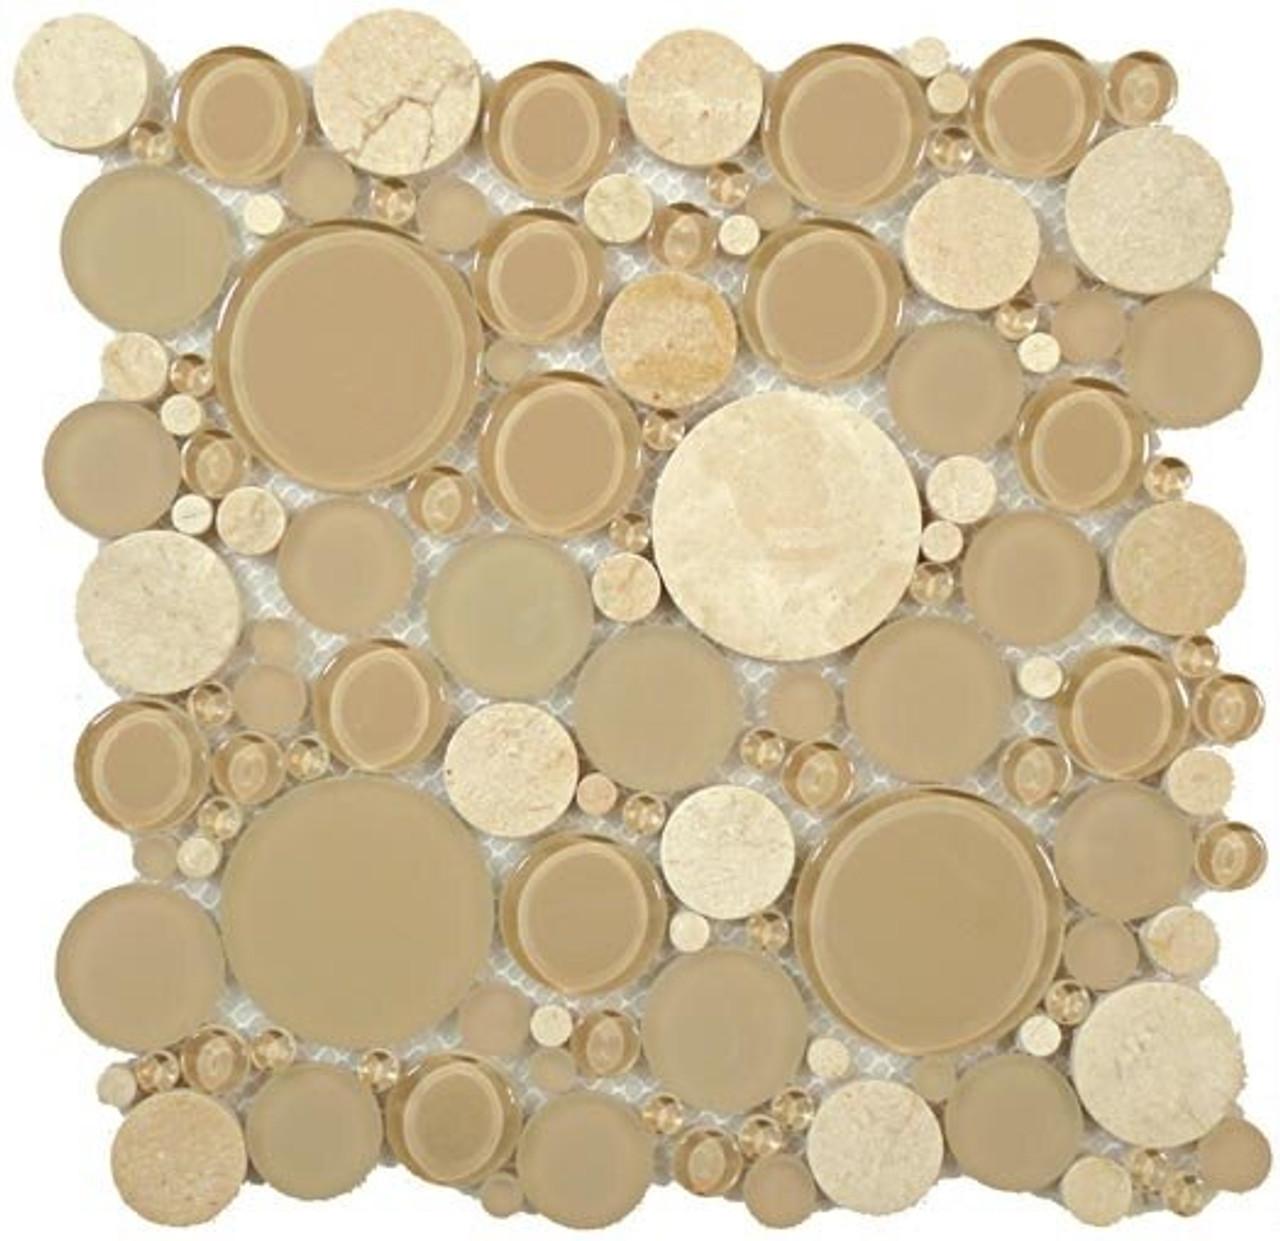 Bella Glass Tiles Bubble Series Random Circles Sable Brown